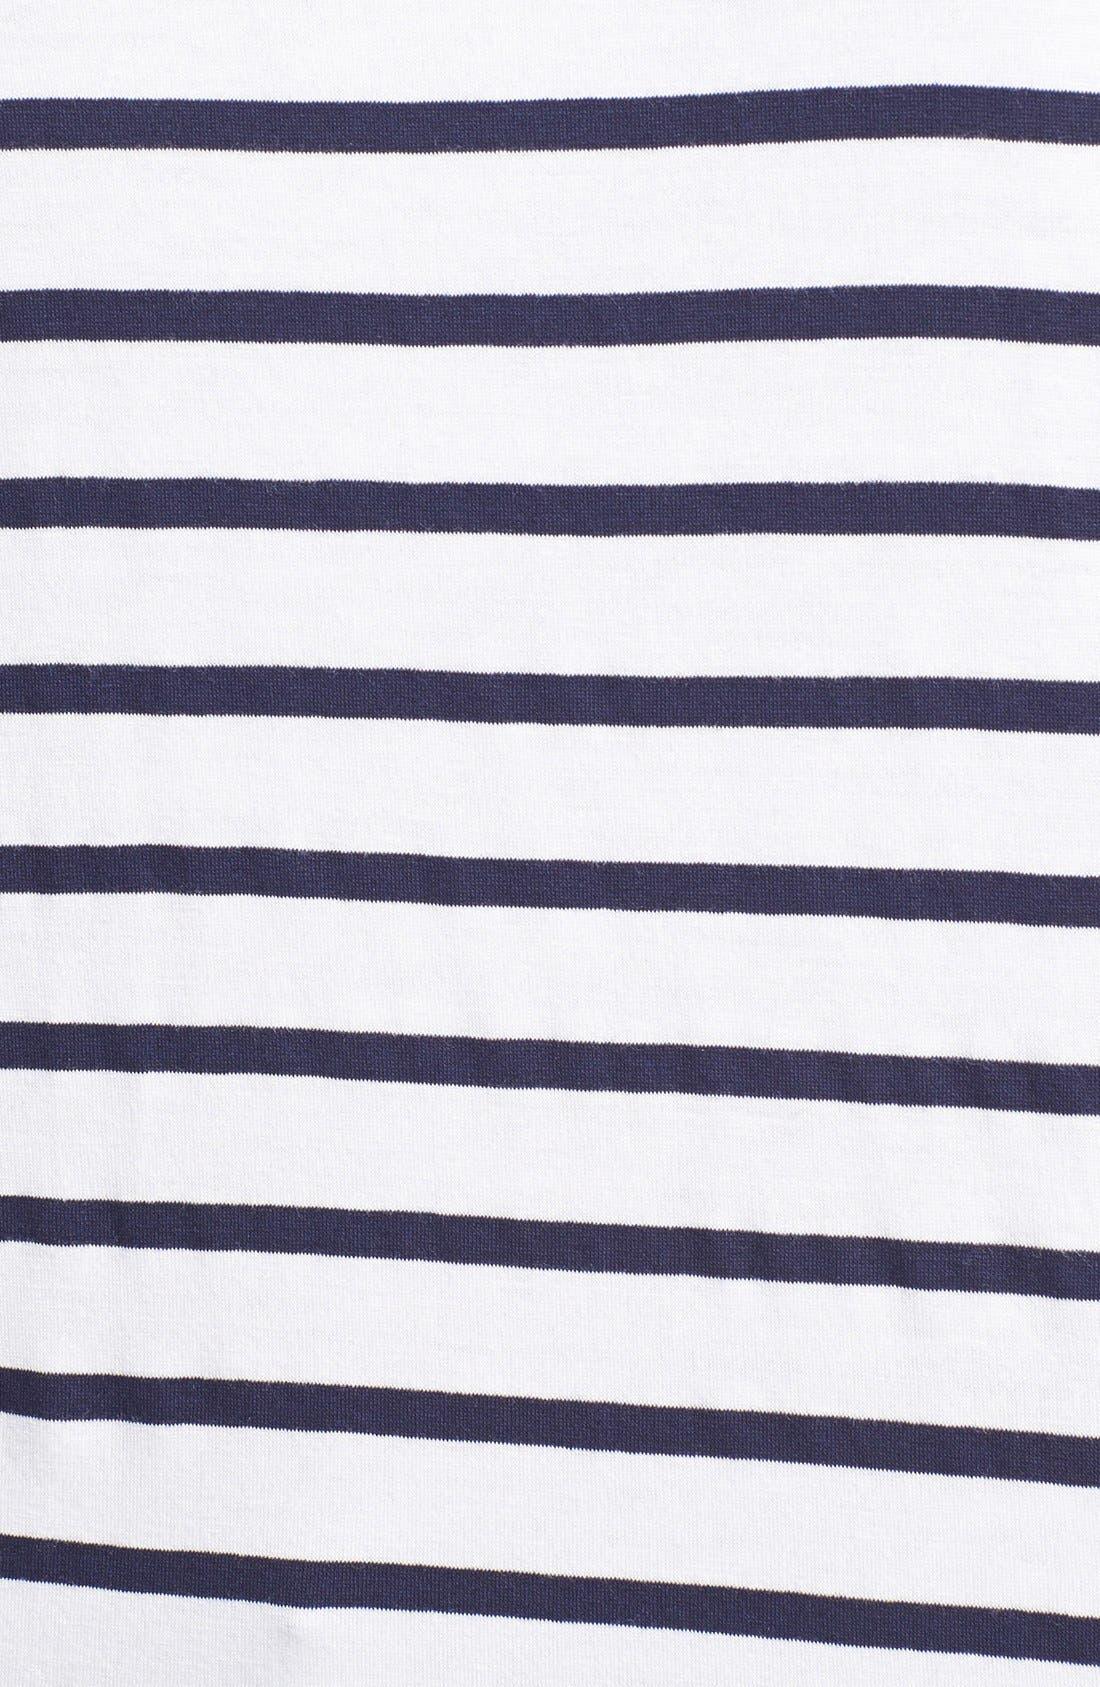 Alternate Image 3  - Pleione Lace Yoke Stripe Tee (Petite)